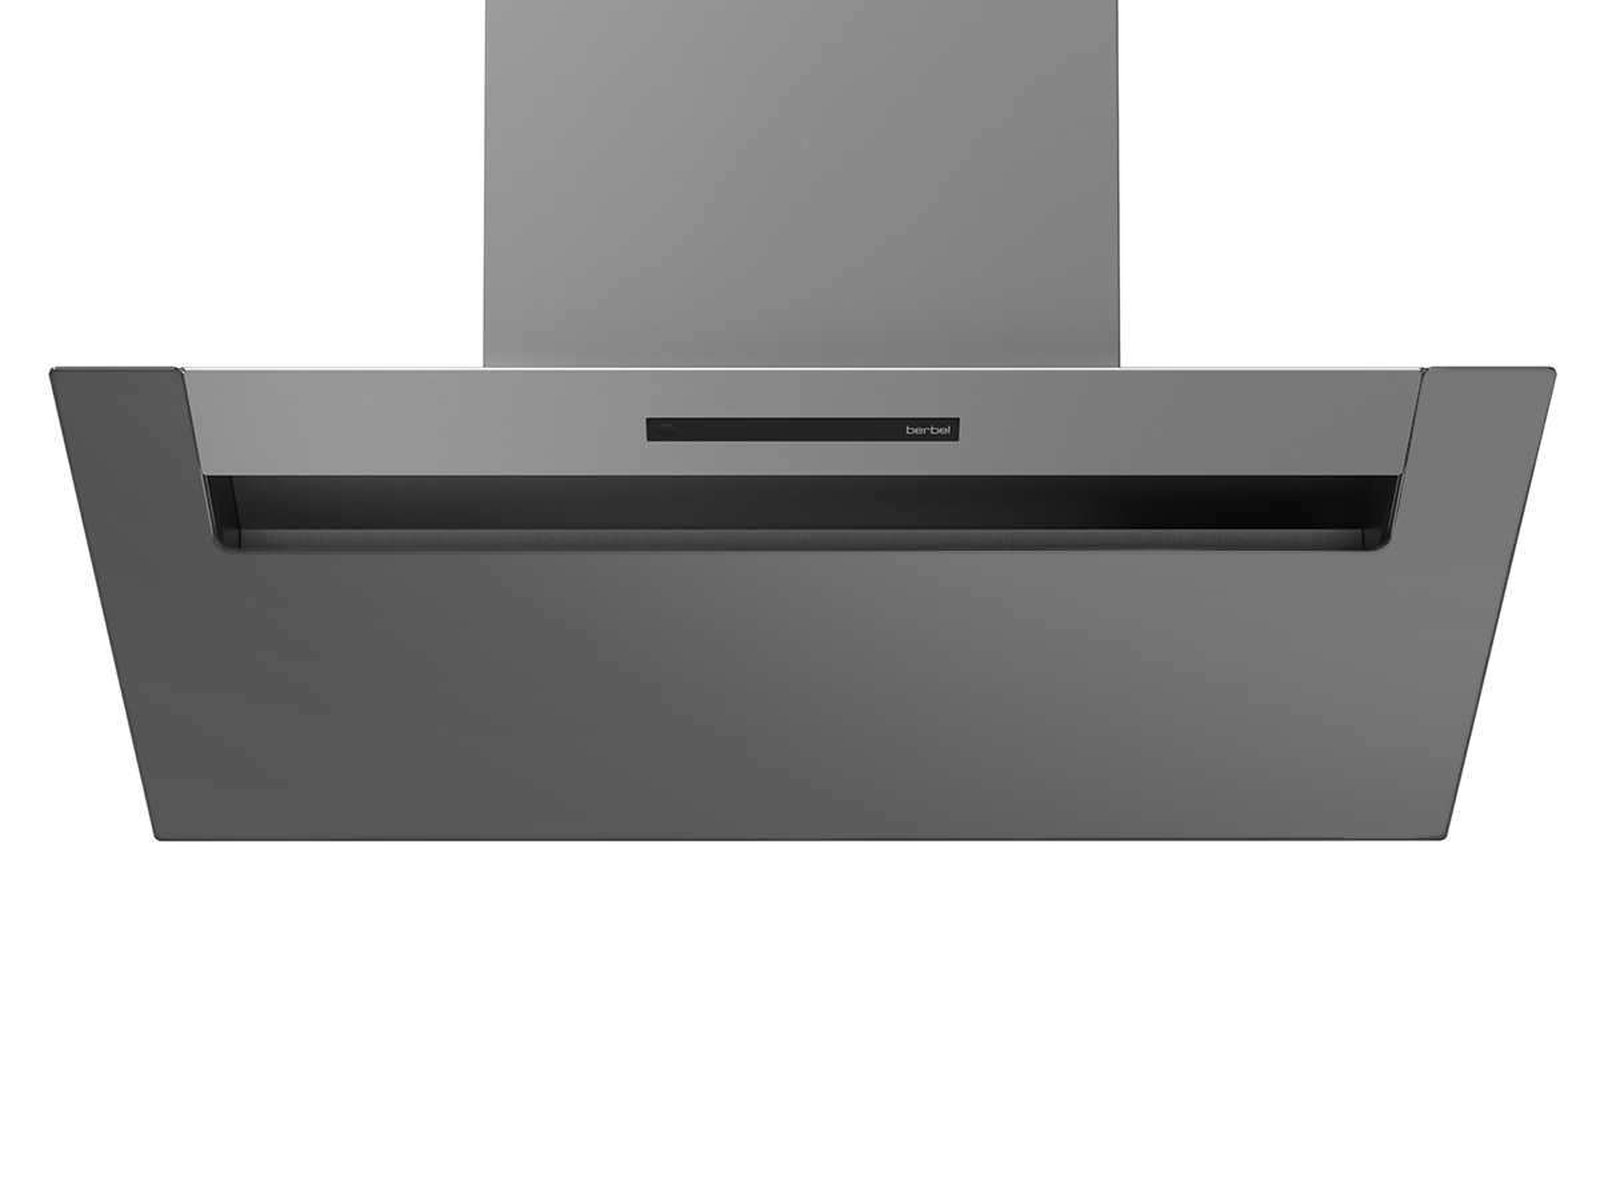 berbel ergoline 2 bkh 80 eg 2 kopffreihaube silber metallic. Black Bedroom Furniture Sets. Home Design Ideas